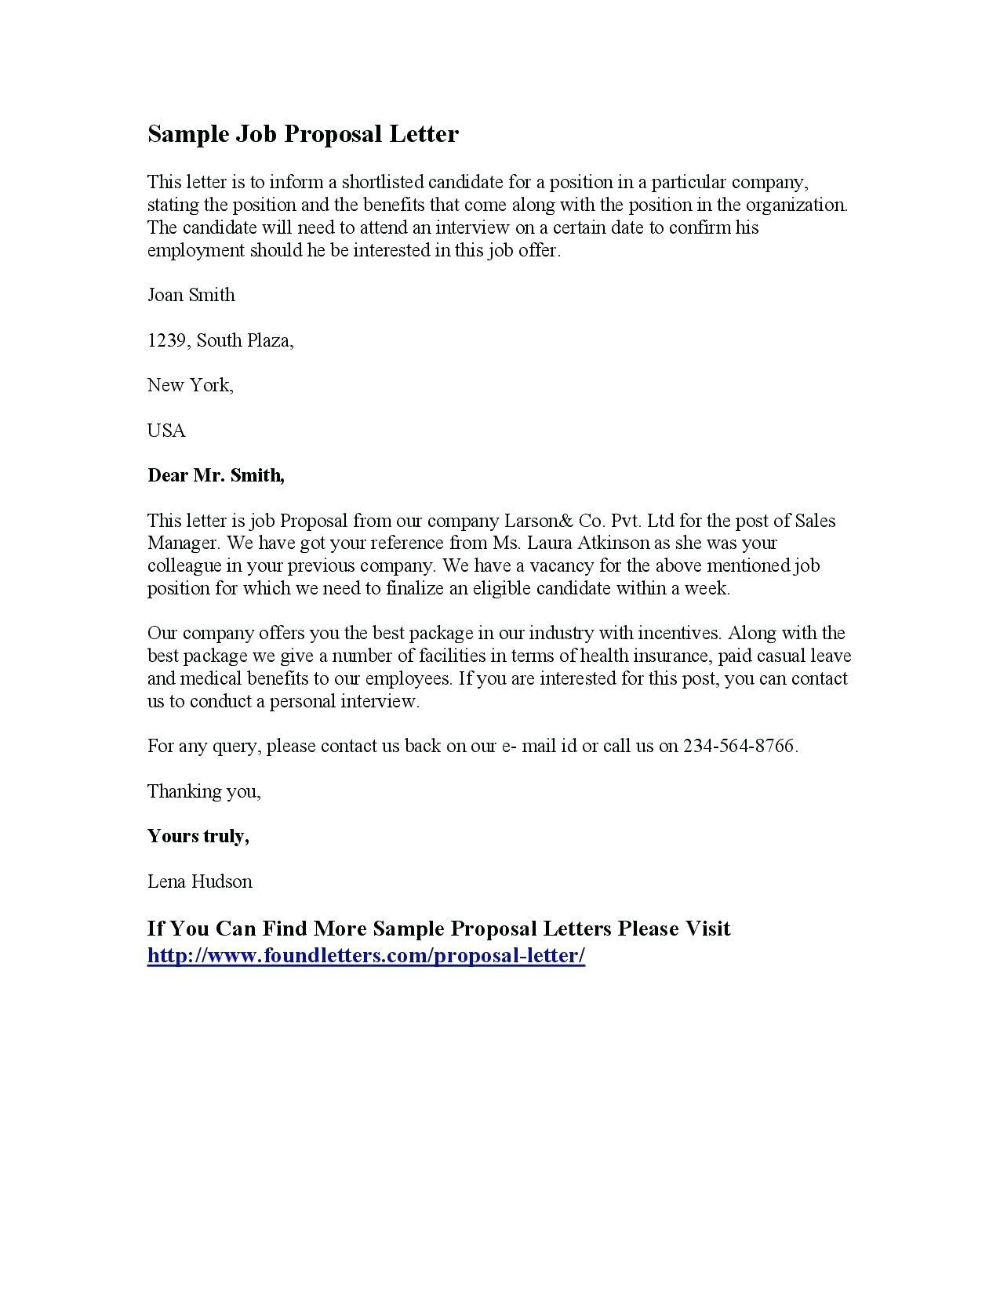 Counter Offer Letter Template Samples Letter Cover Templates With Regard To Counter Offer Letter Template Proposal Letter Proposal Writing Proposal Templates